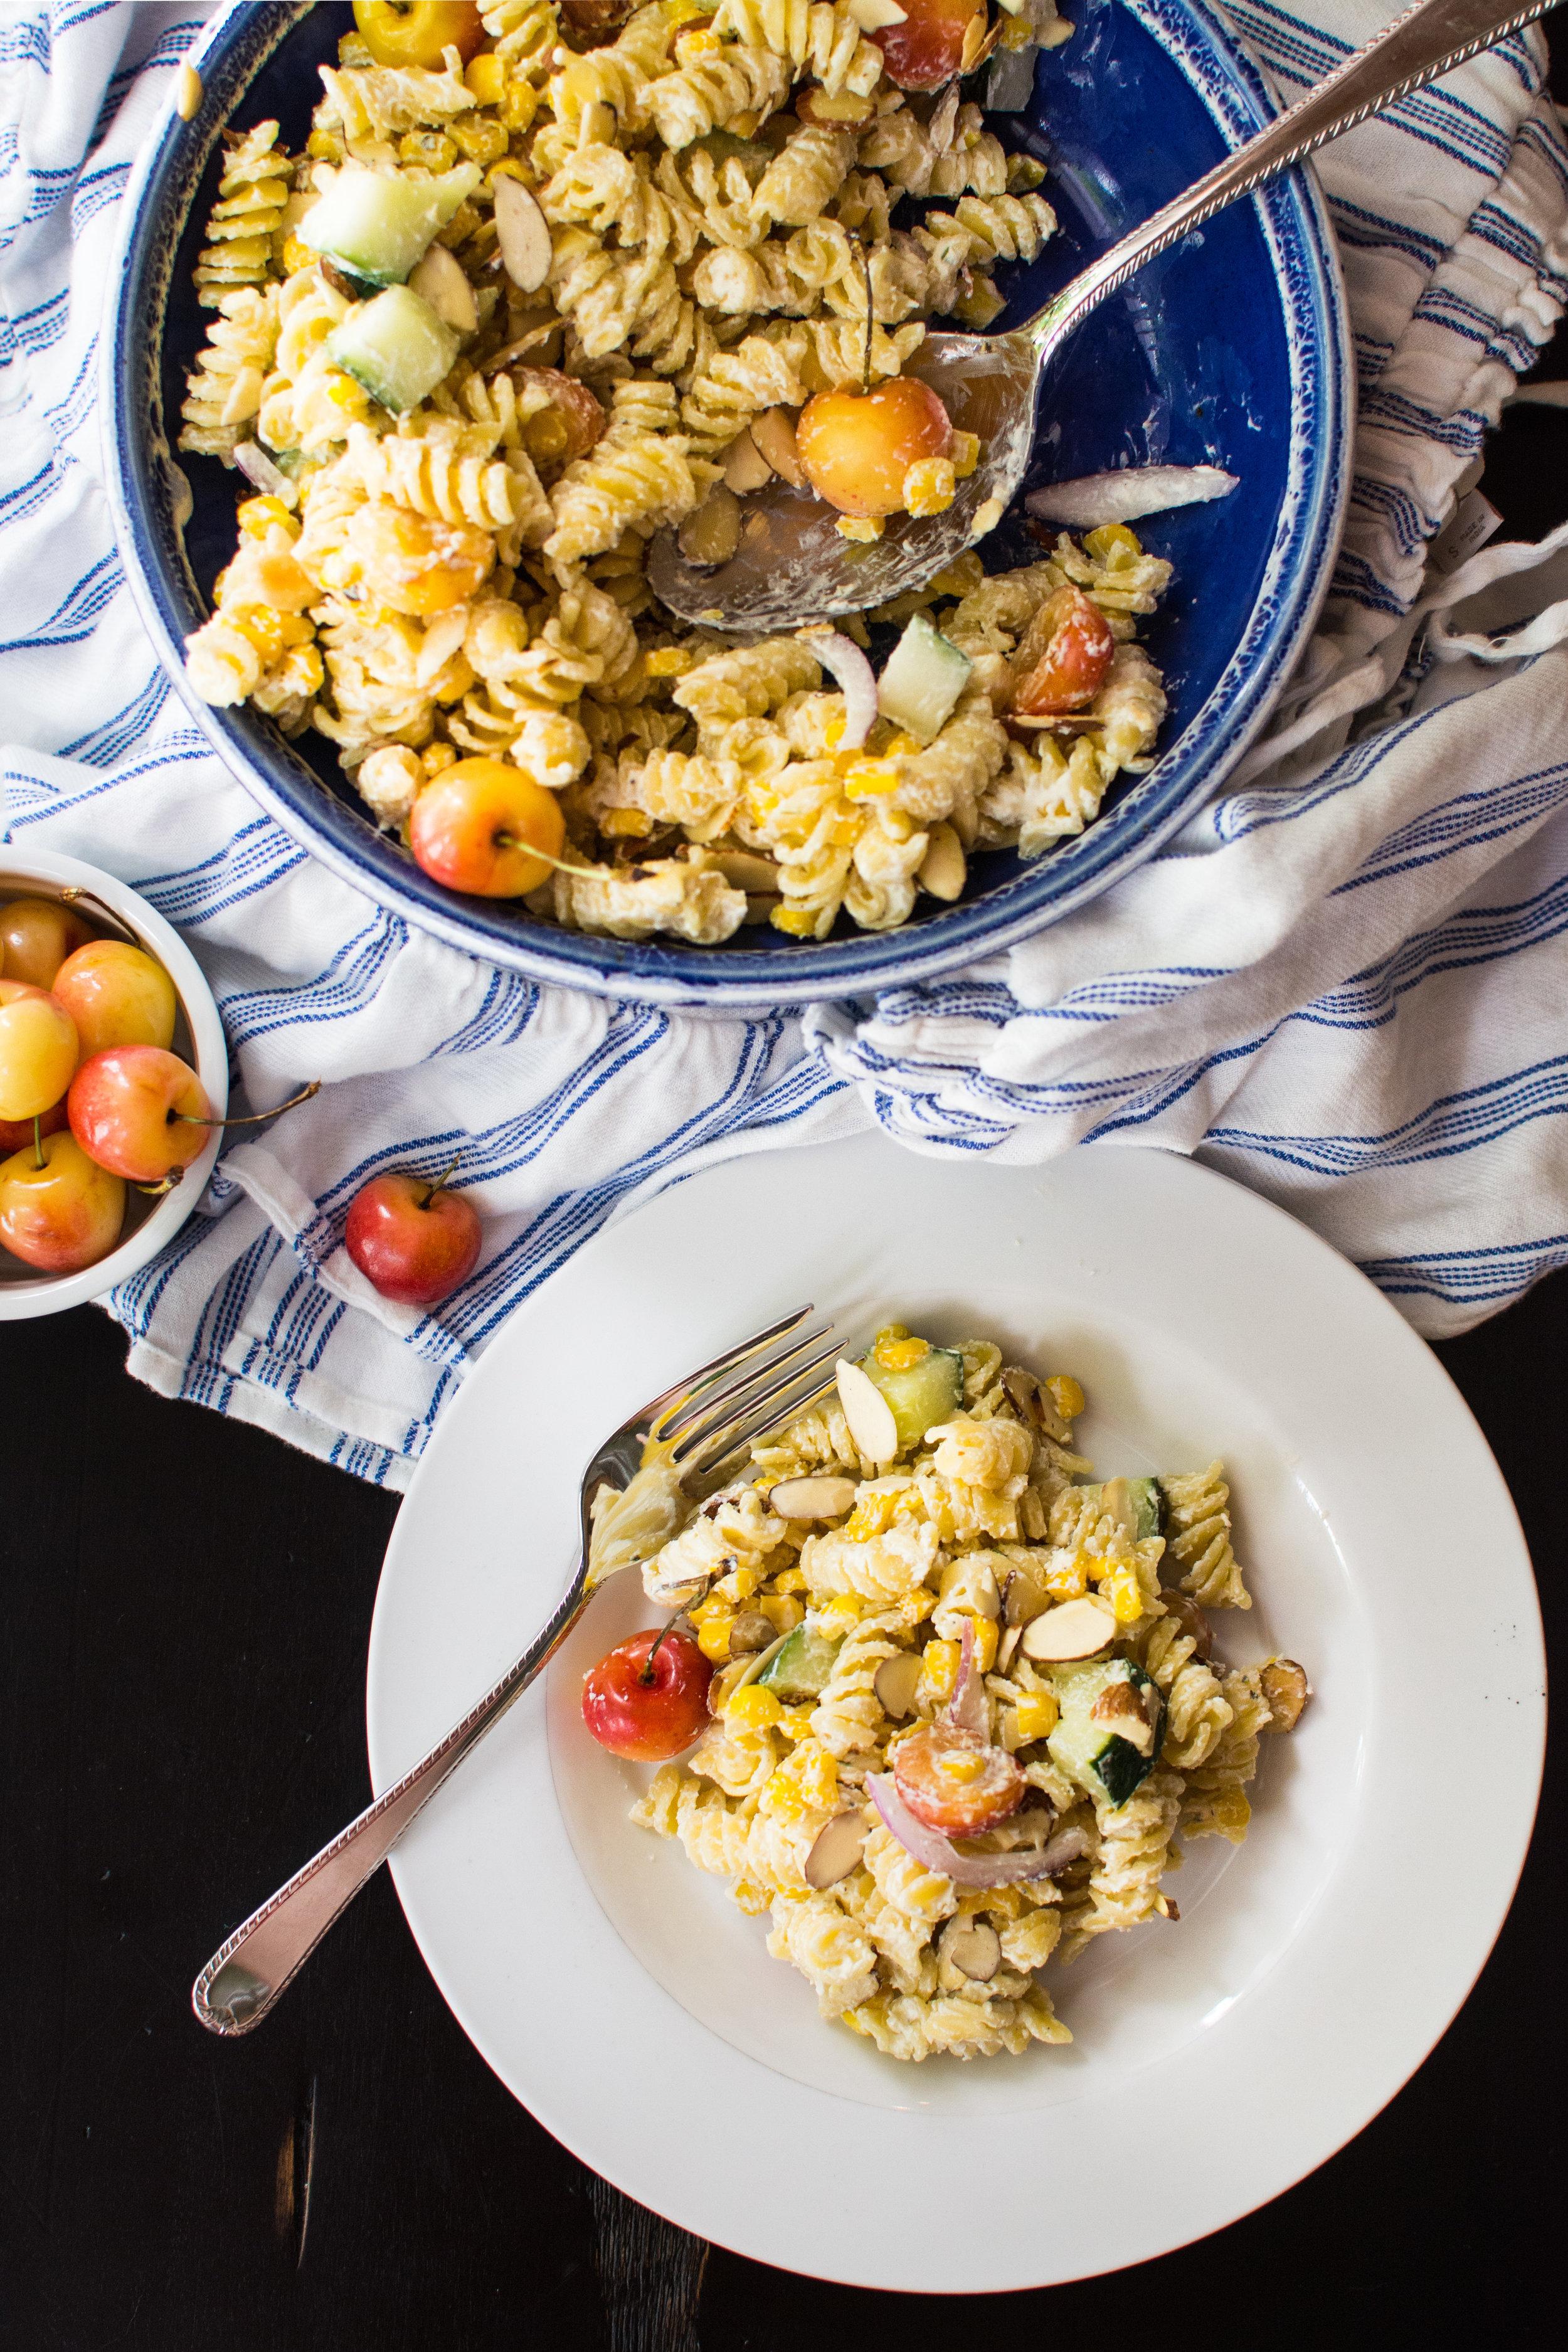 Boursin Pasta Salad with Cherries, Corn and Cucumber